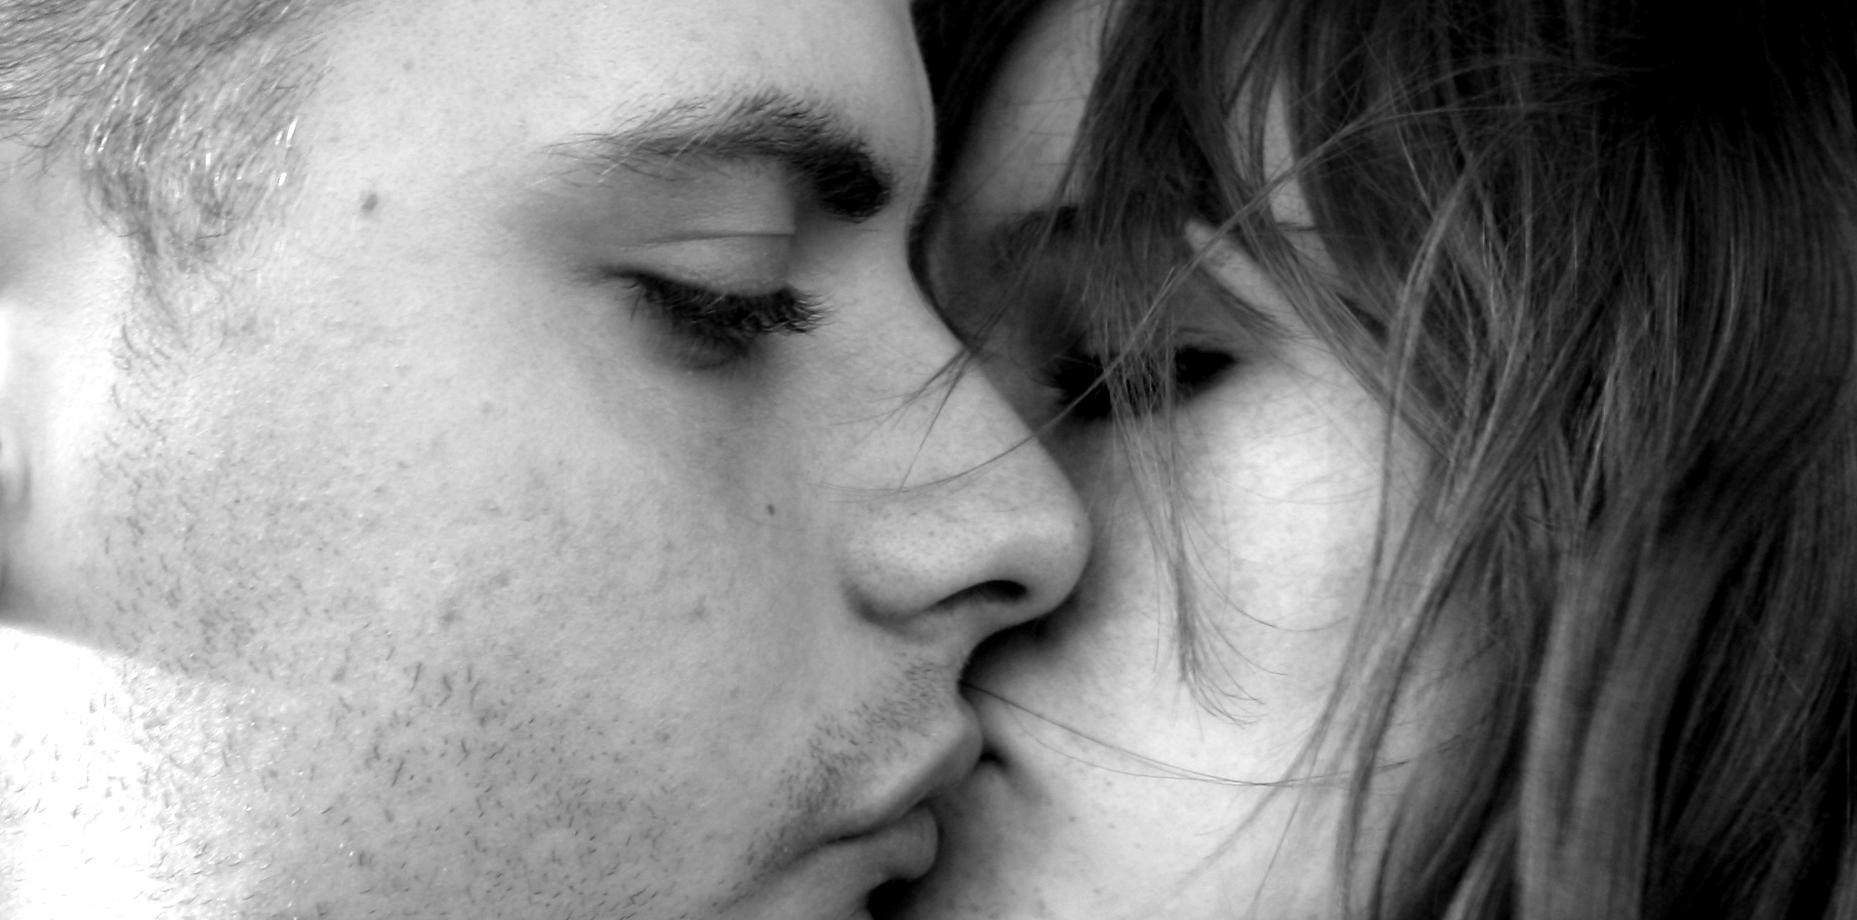 Le baiser ...